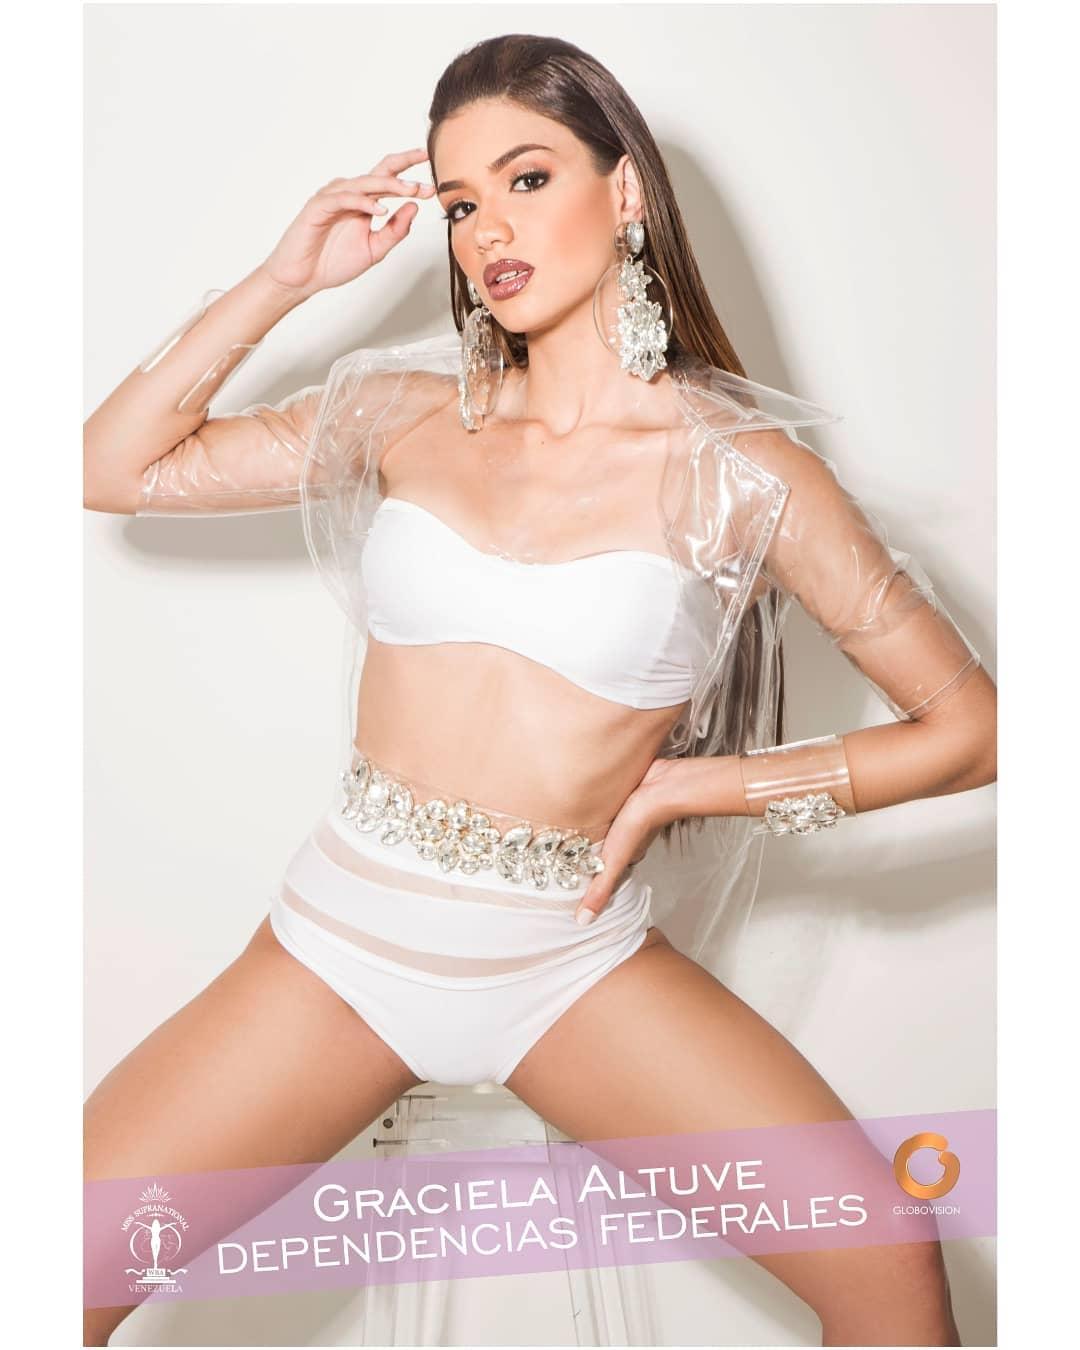 official de candidatas a miss earth venezuela 2019. final: 25 agosto. - Página 3 1Vc8eo